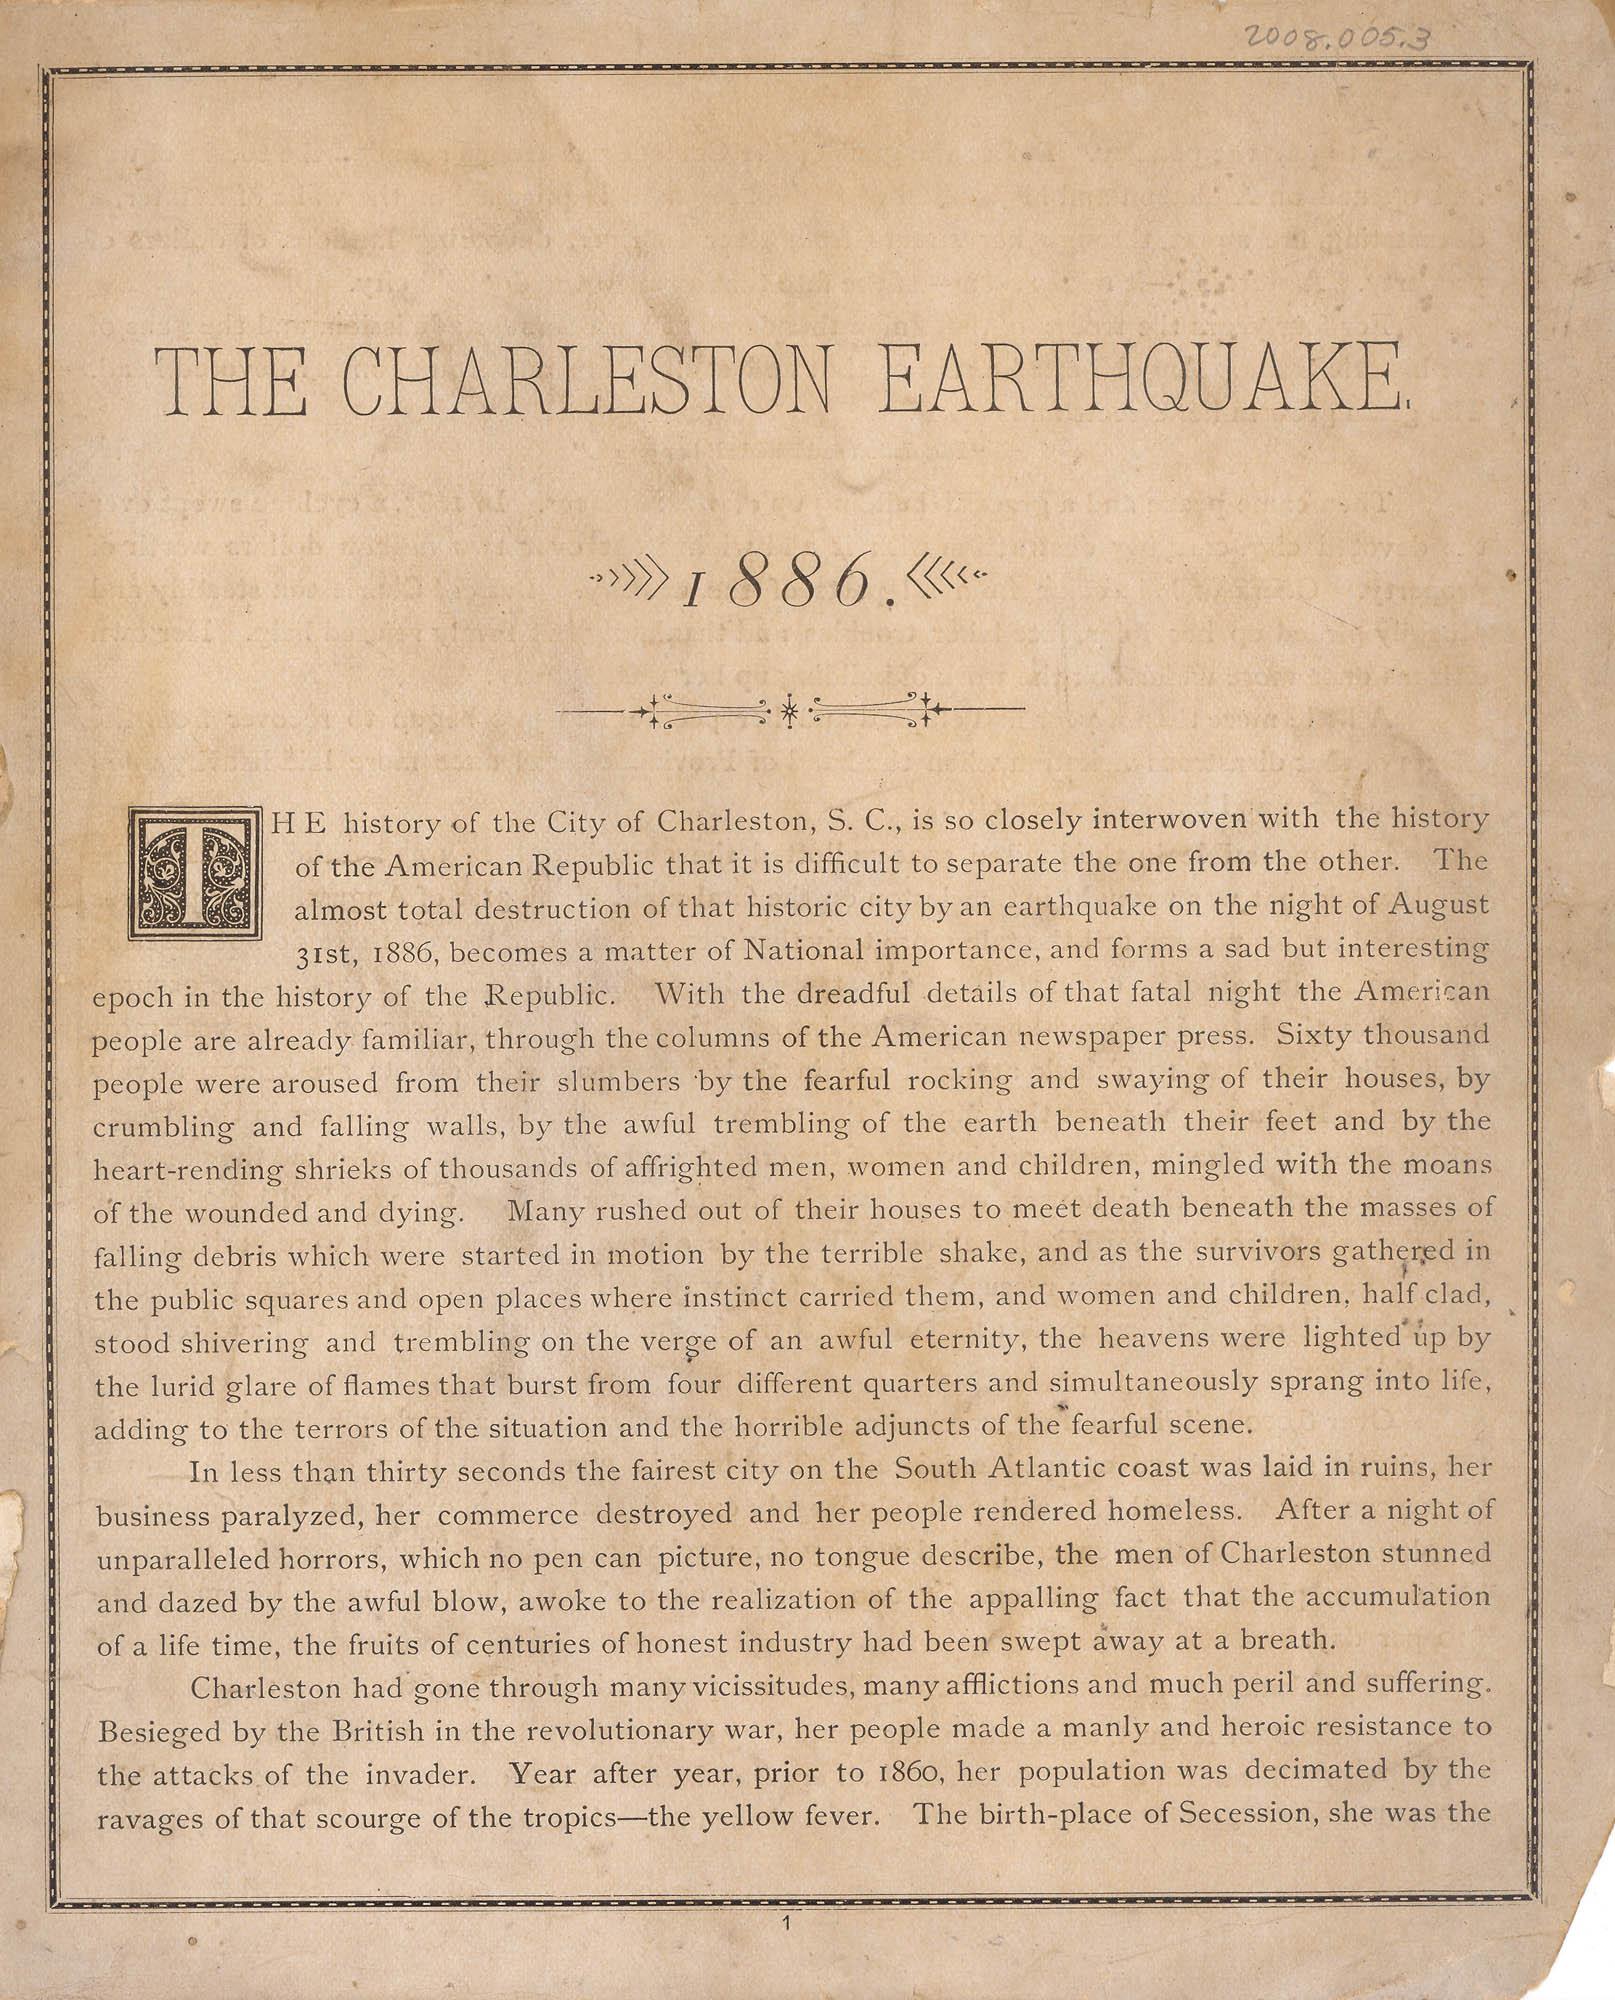 The Charleston Earthquake, 1886